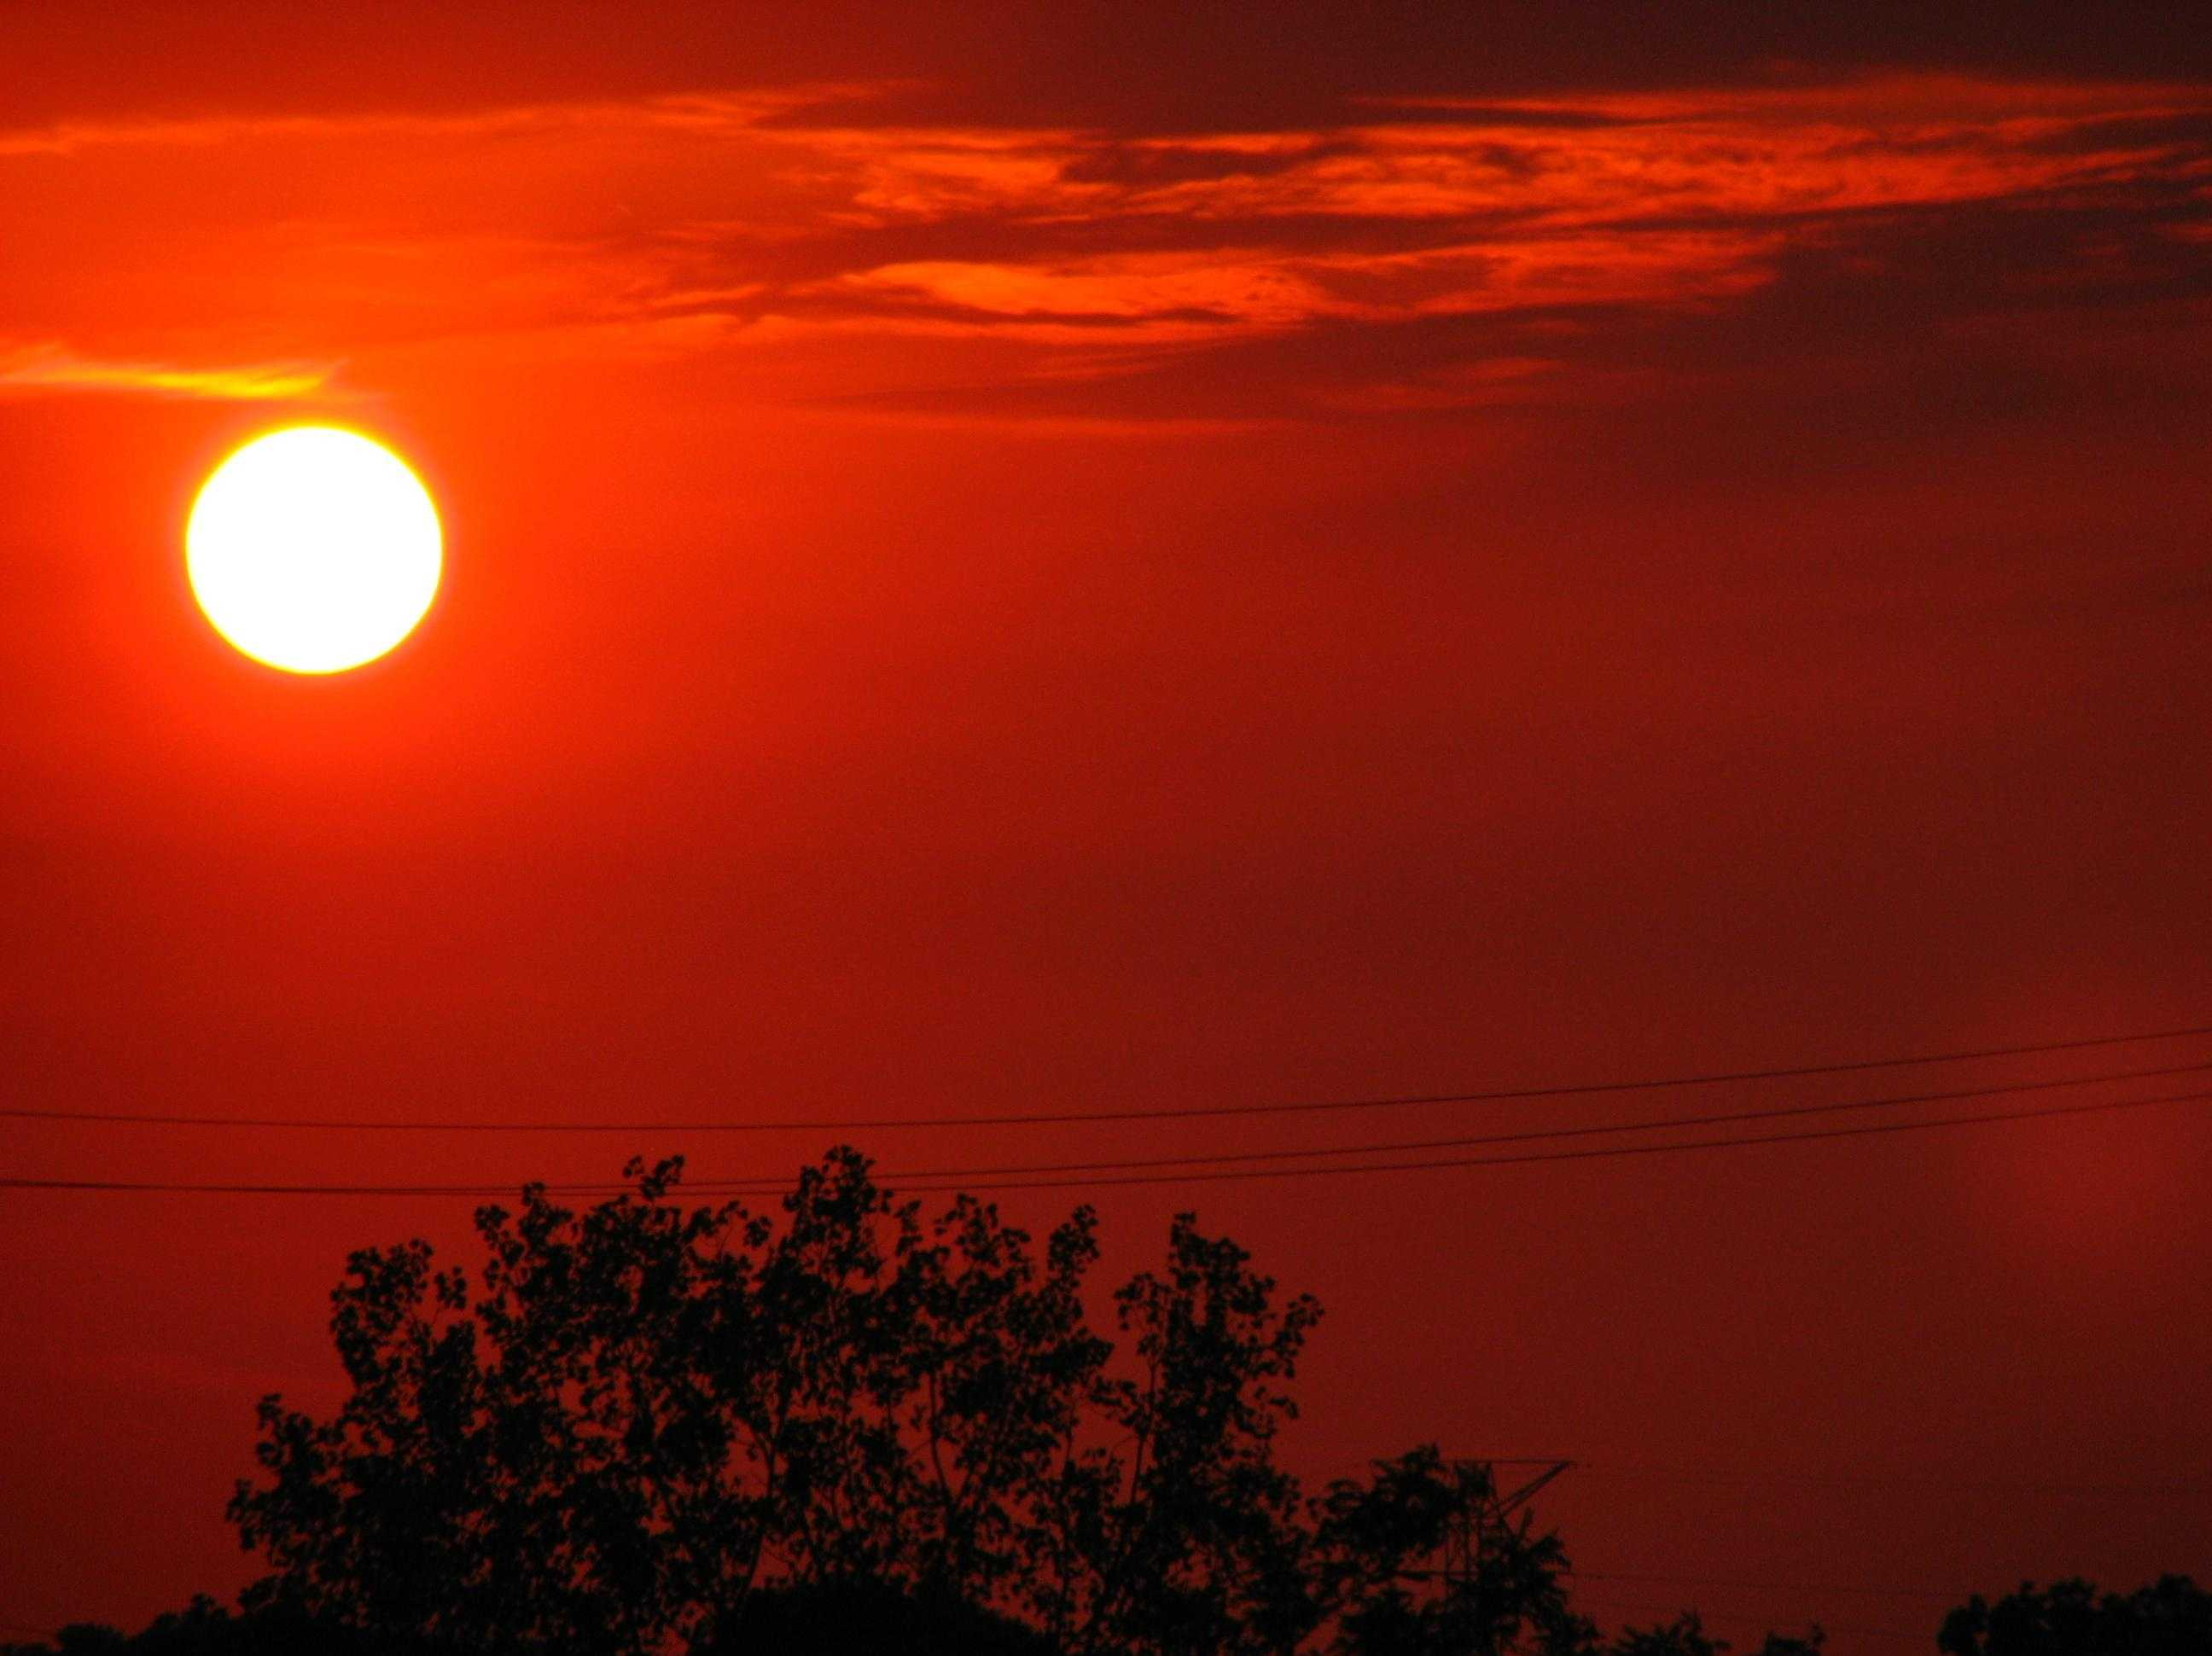 Generic Sun Sunset Heat - 13796344